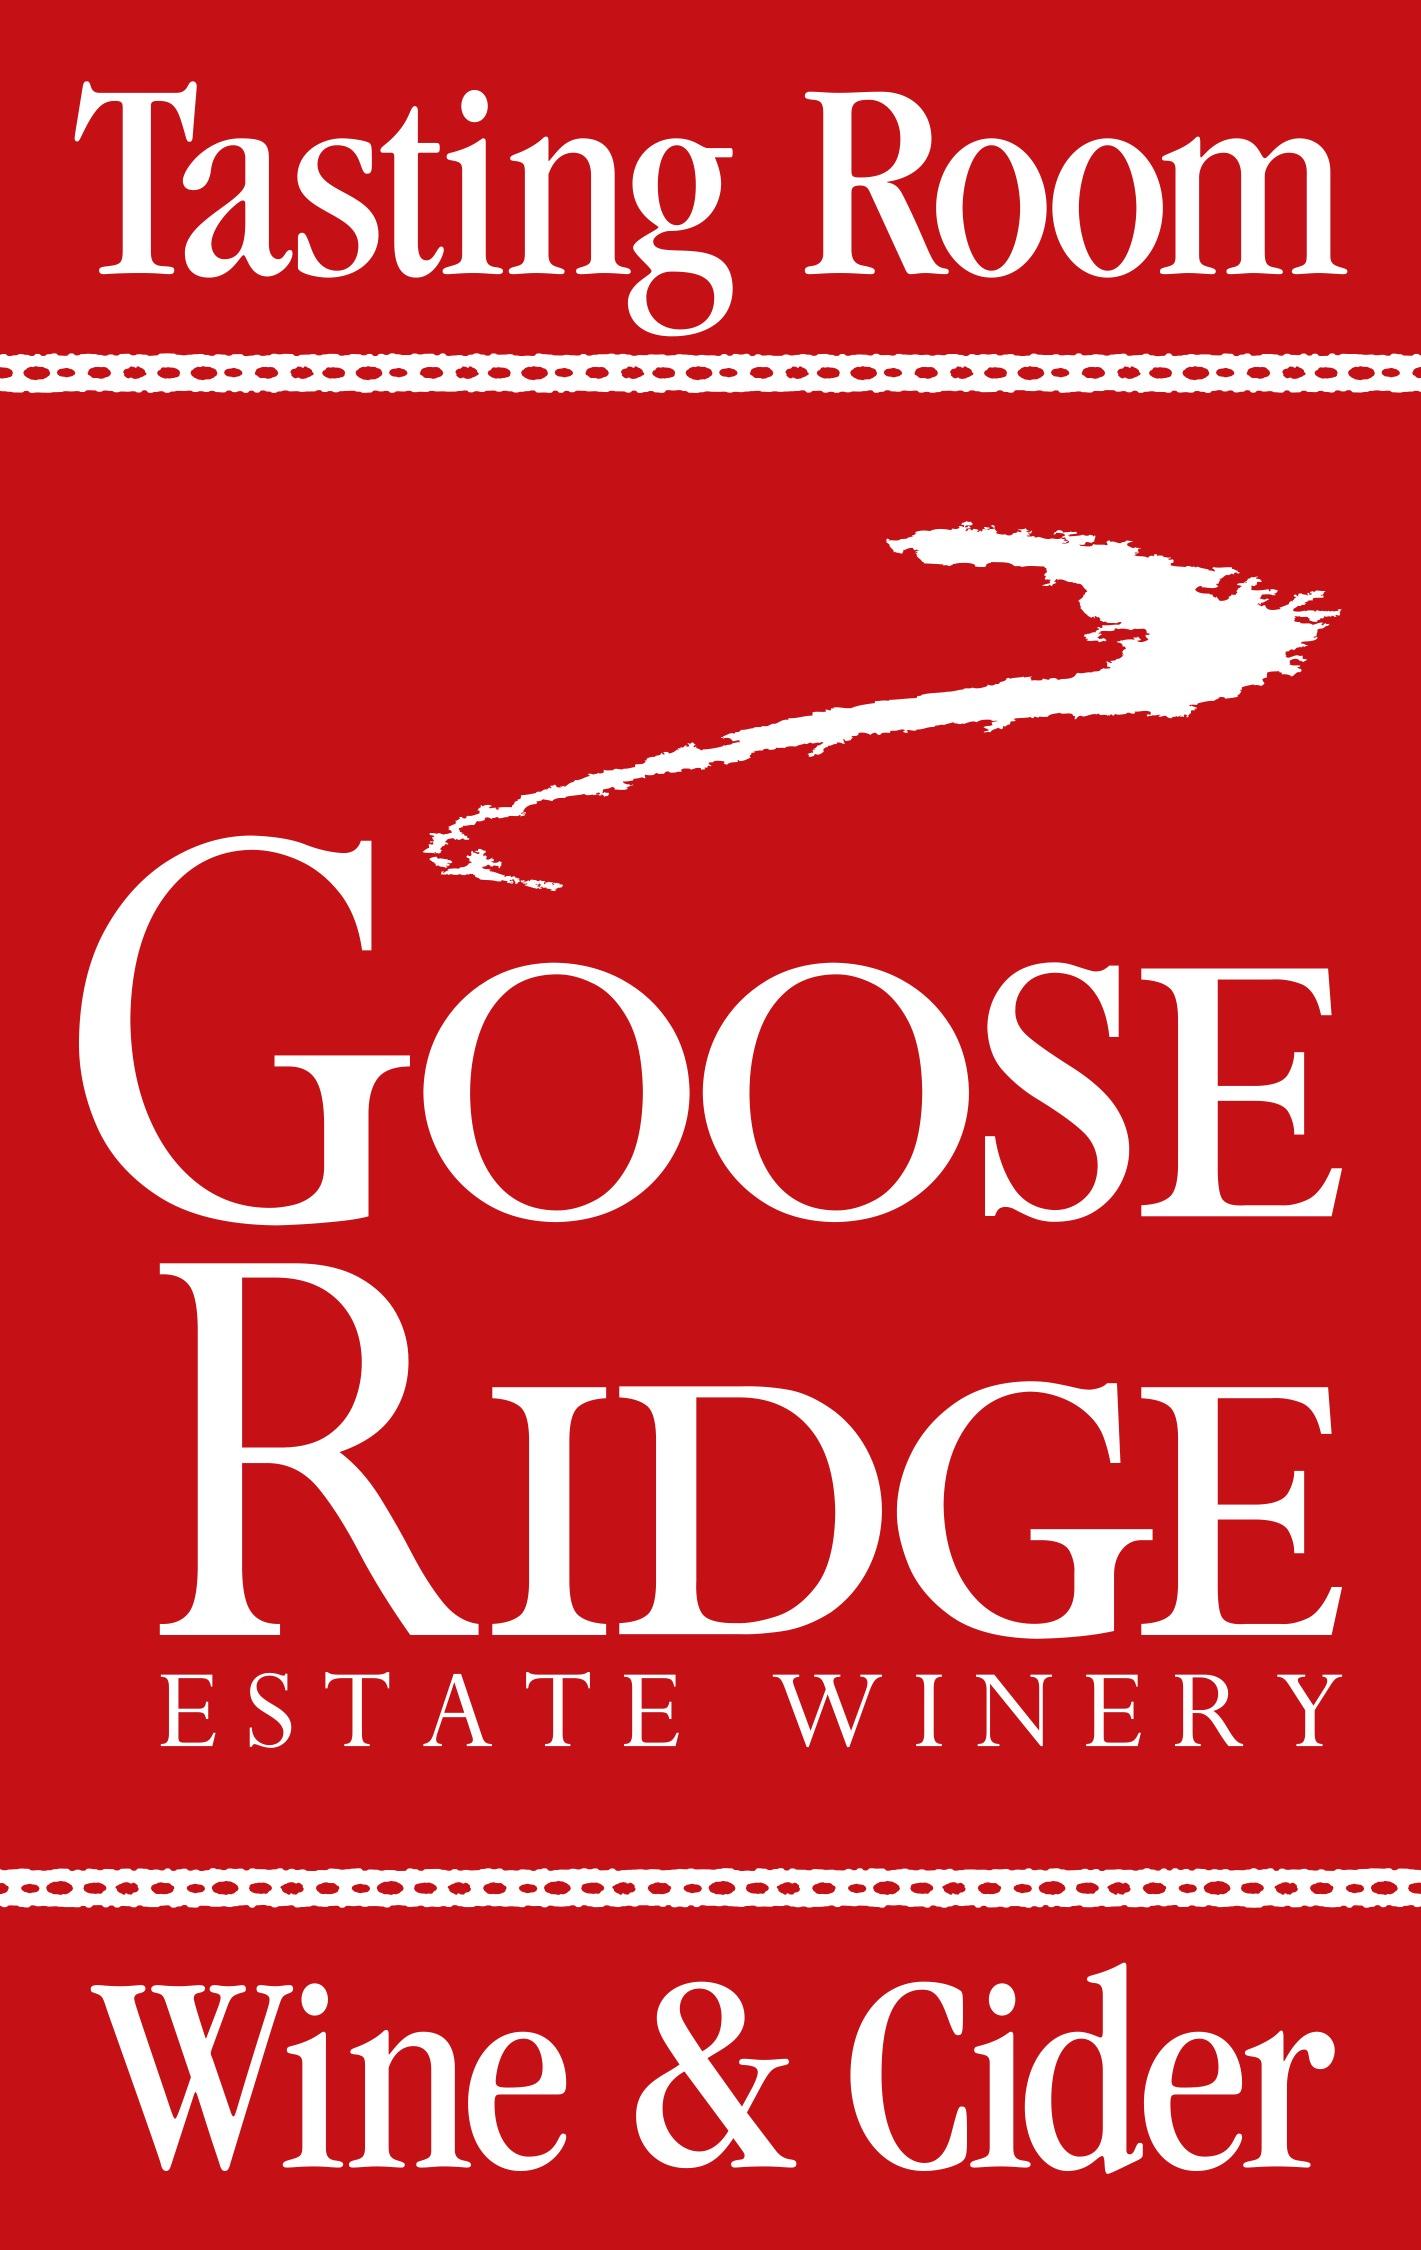 Goose Ridge Sign Options-6.jpg